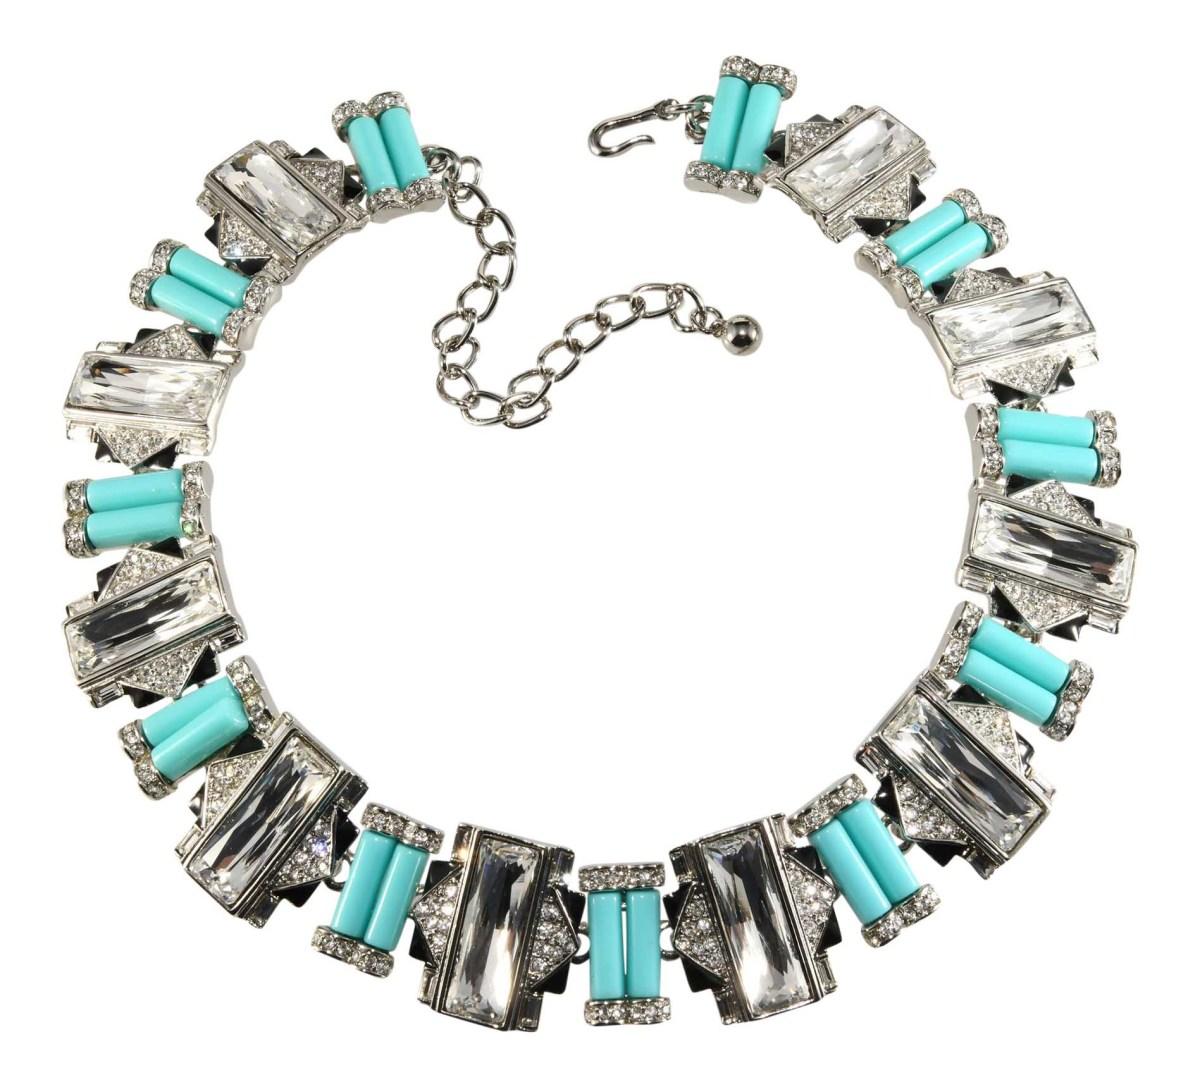 Kenneth Lane collar necklace